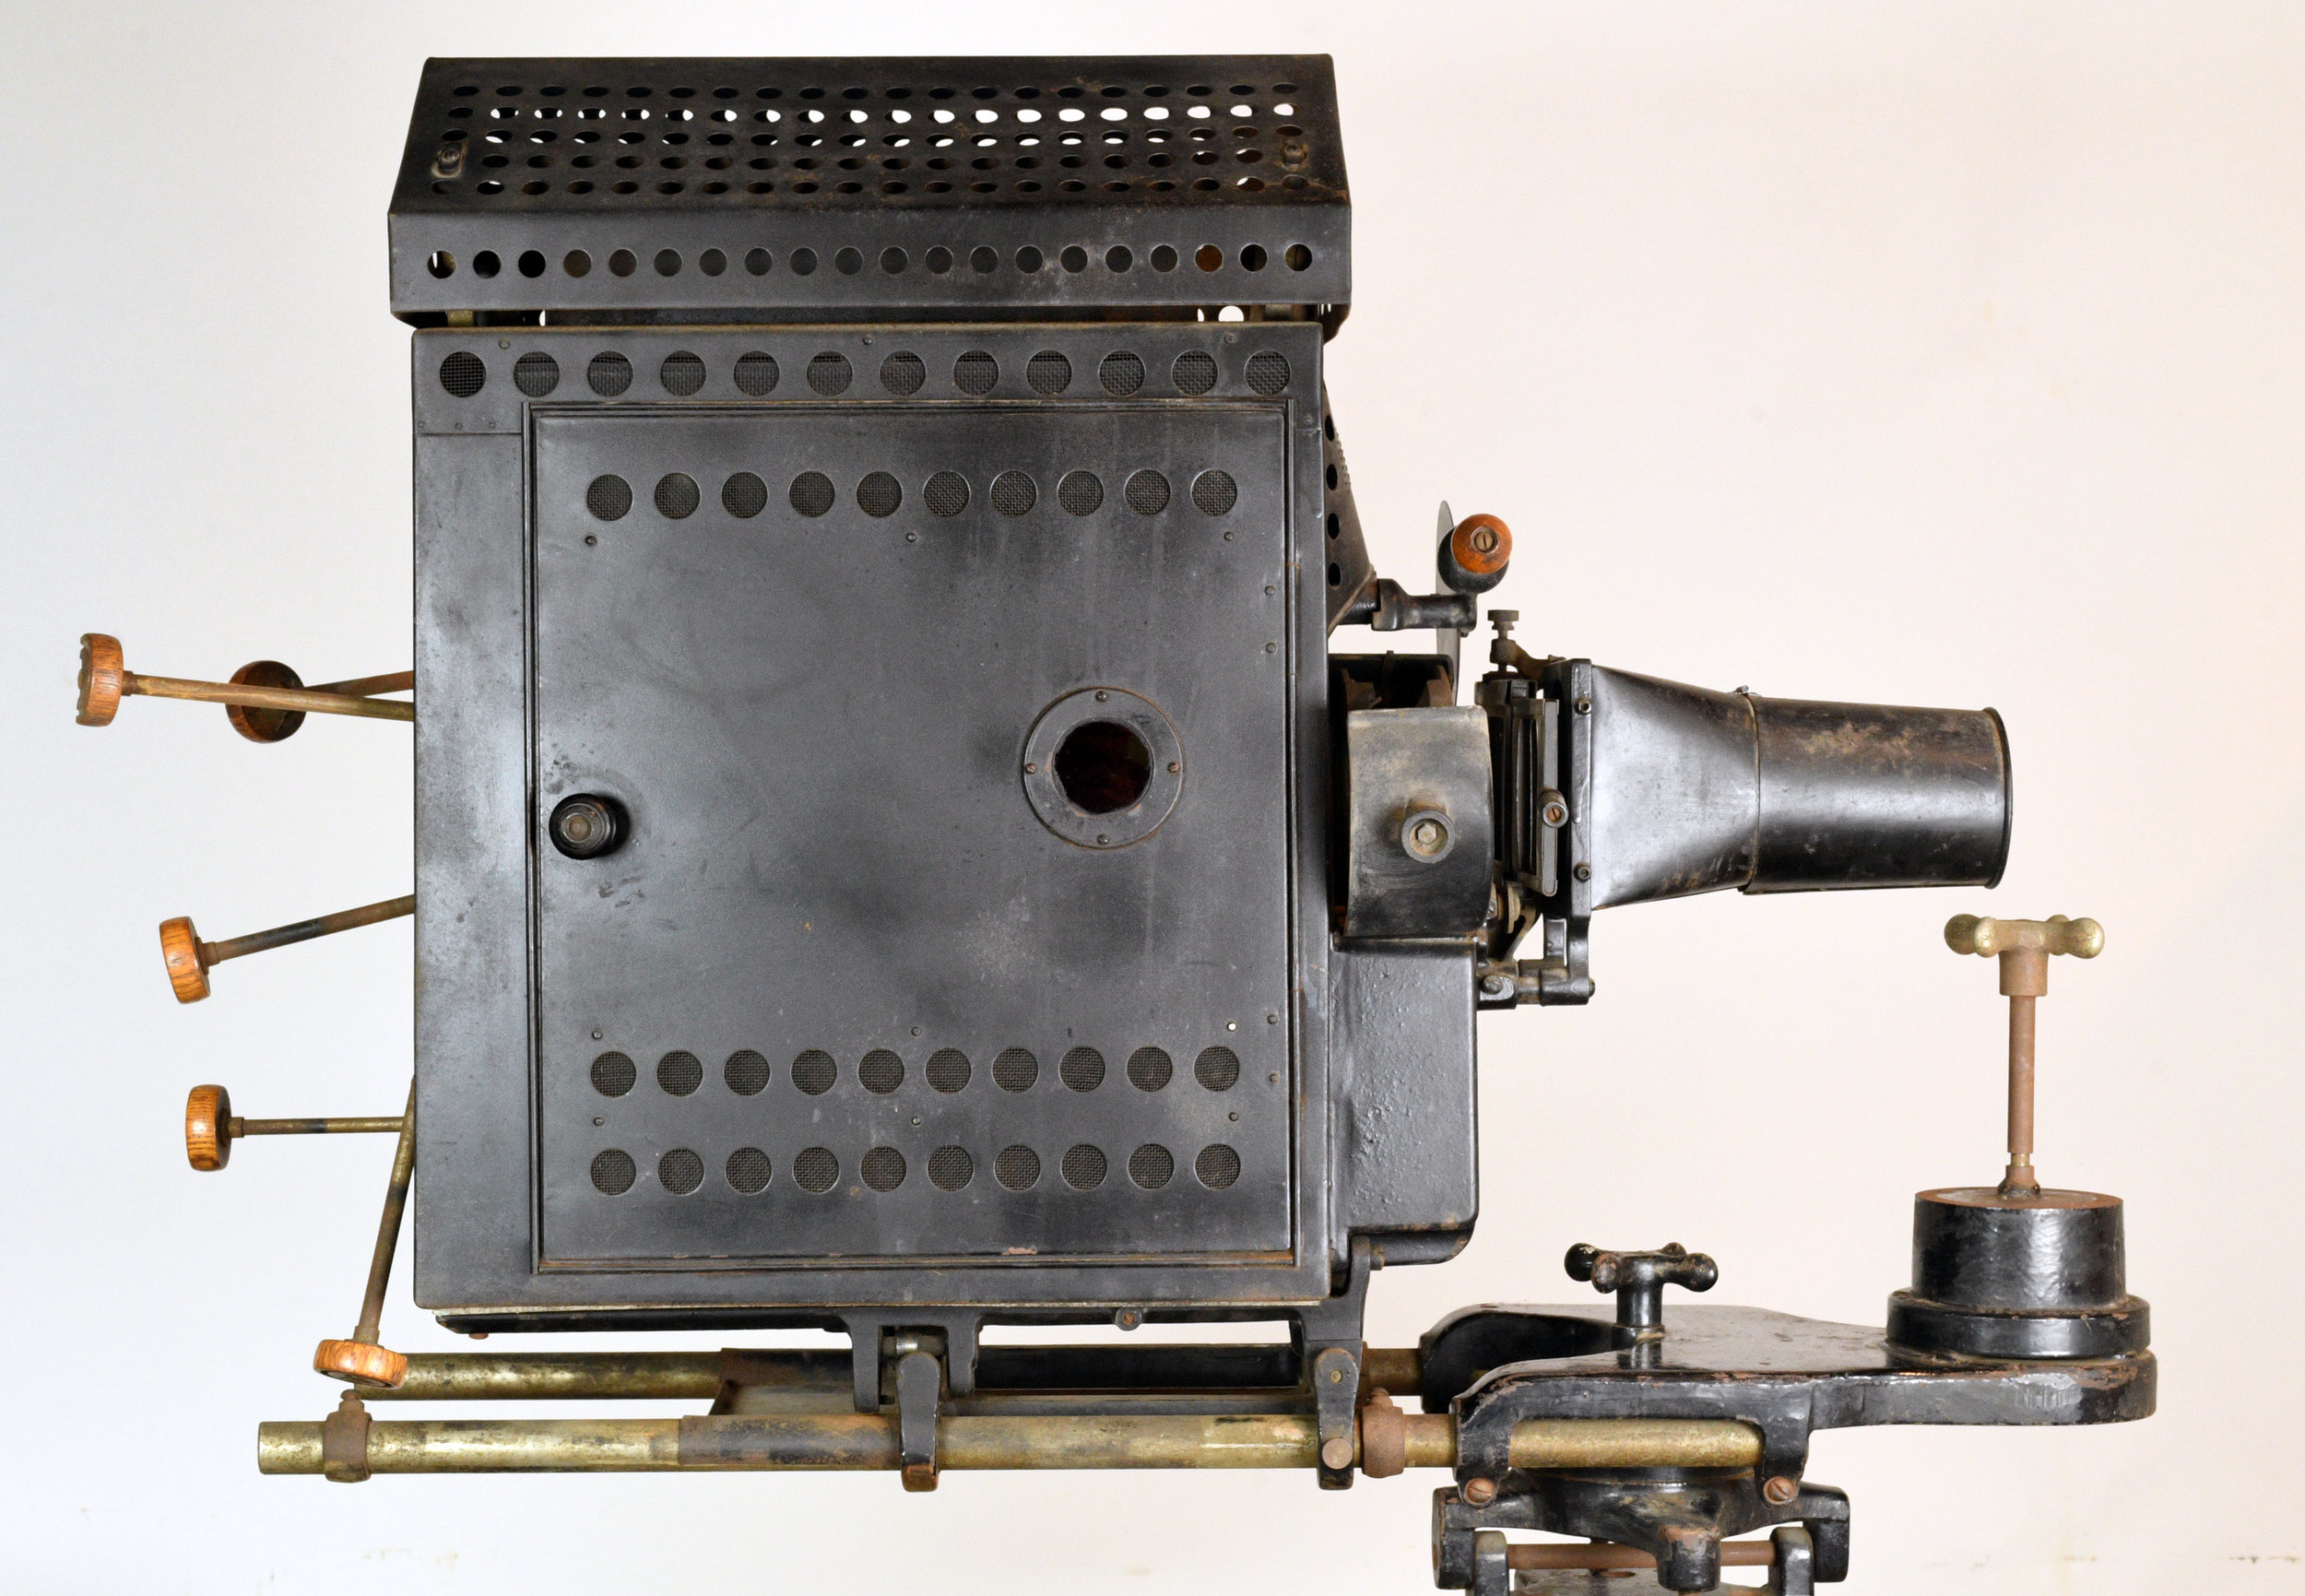 47904-motiograph-projector-door-closed.jpg